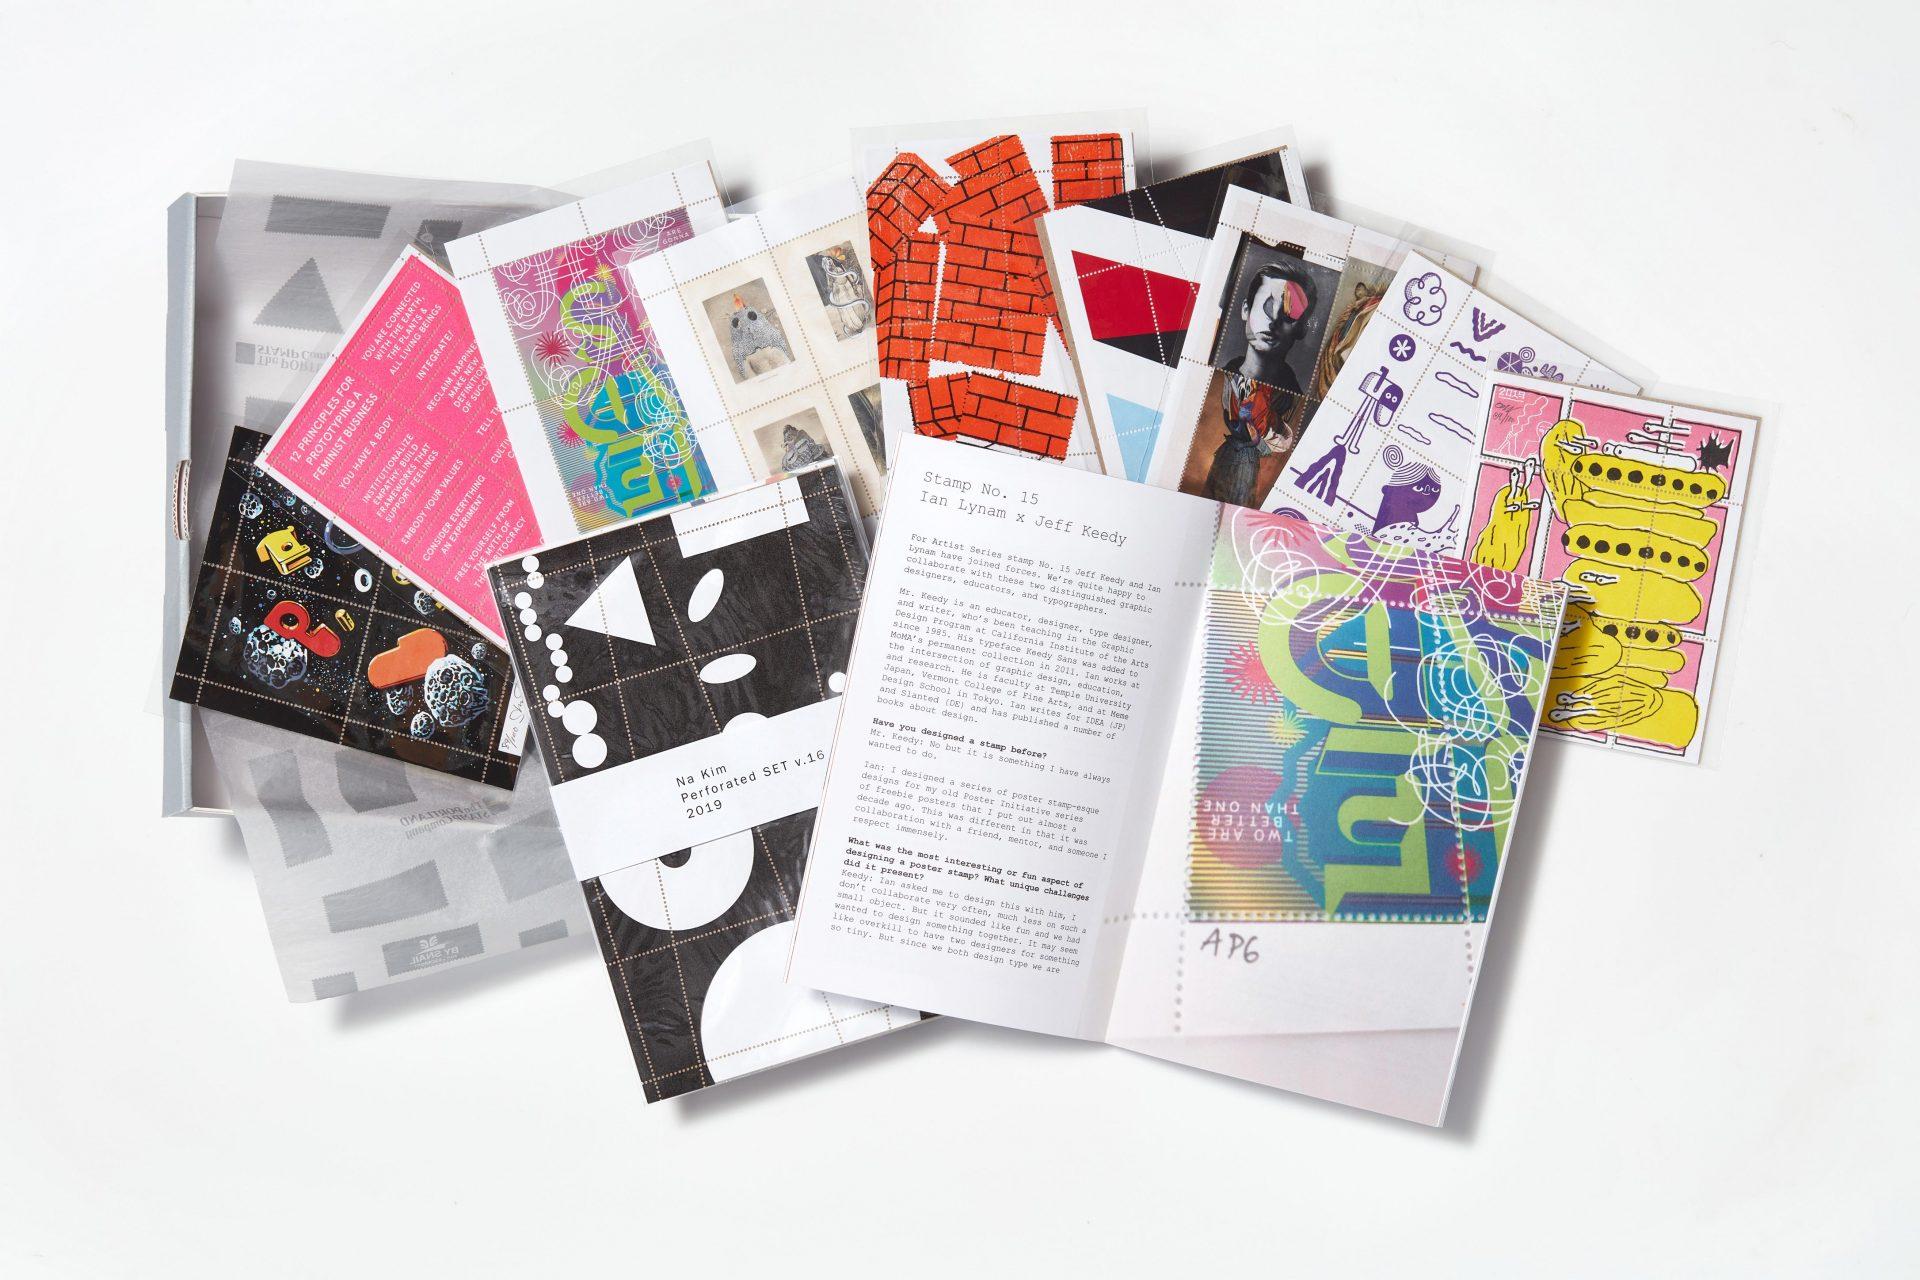 portland-stamp-company-artist-series-11-20-open